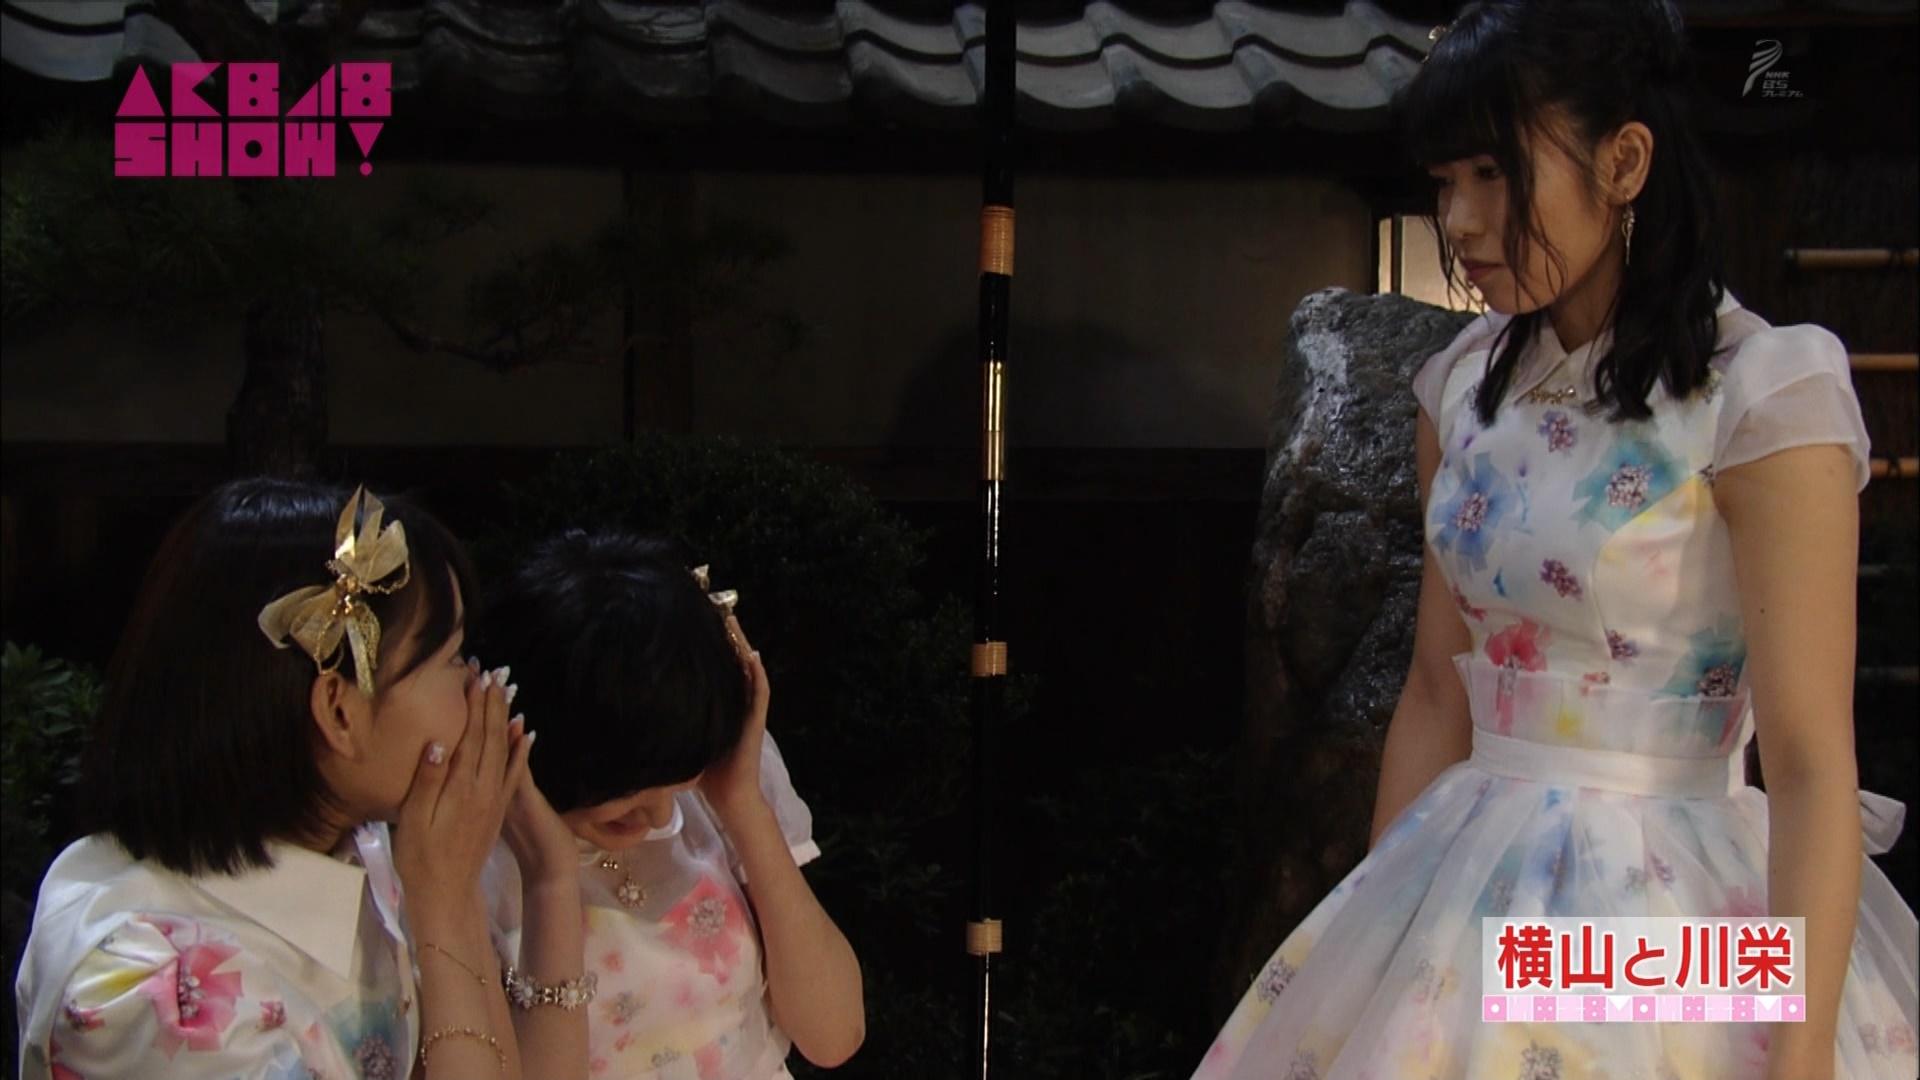 横山由依と川栄李奈 AKB48SHOW! 20140906 (52)